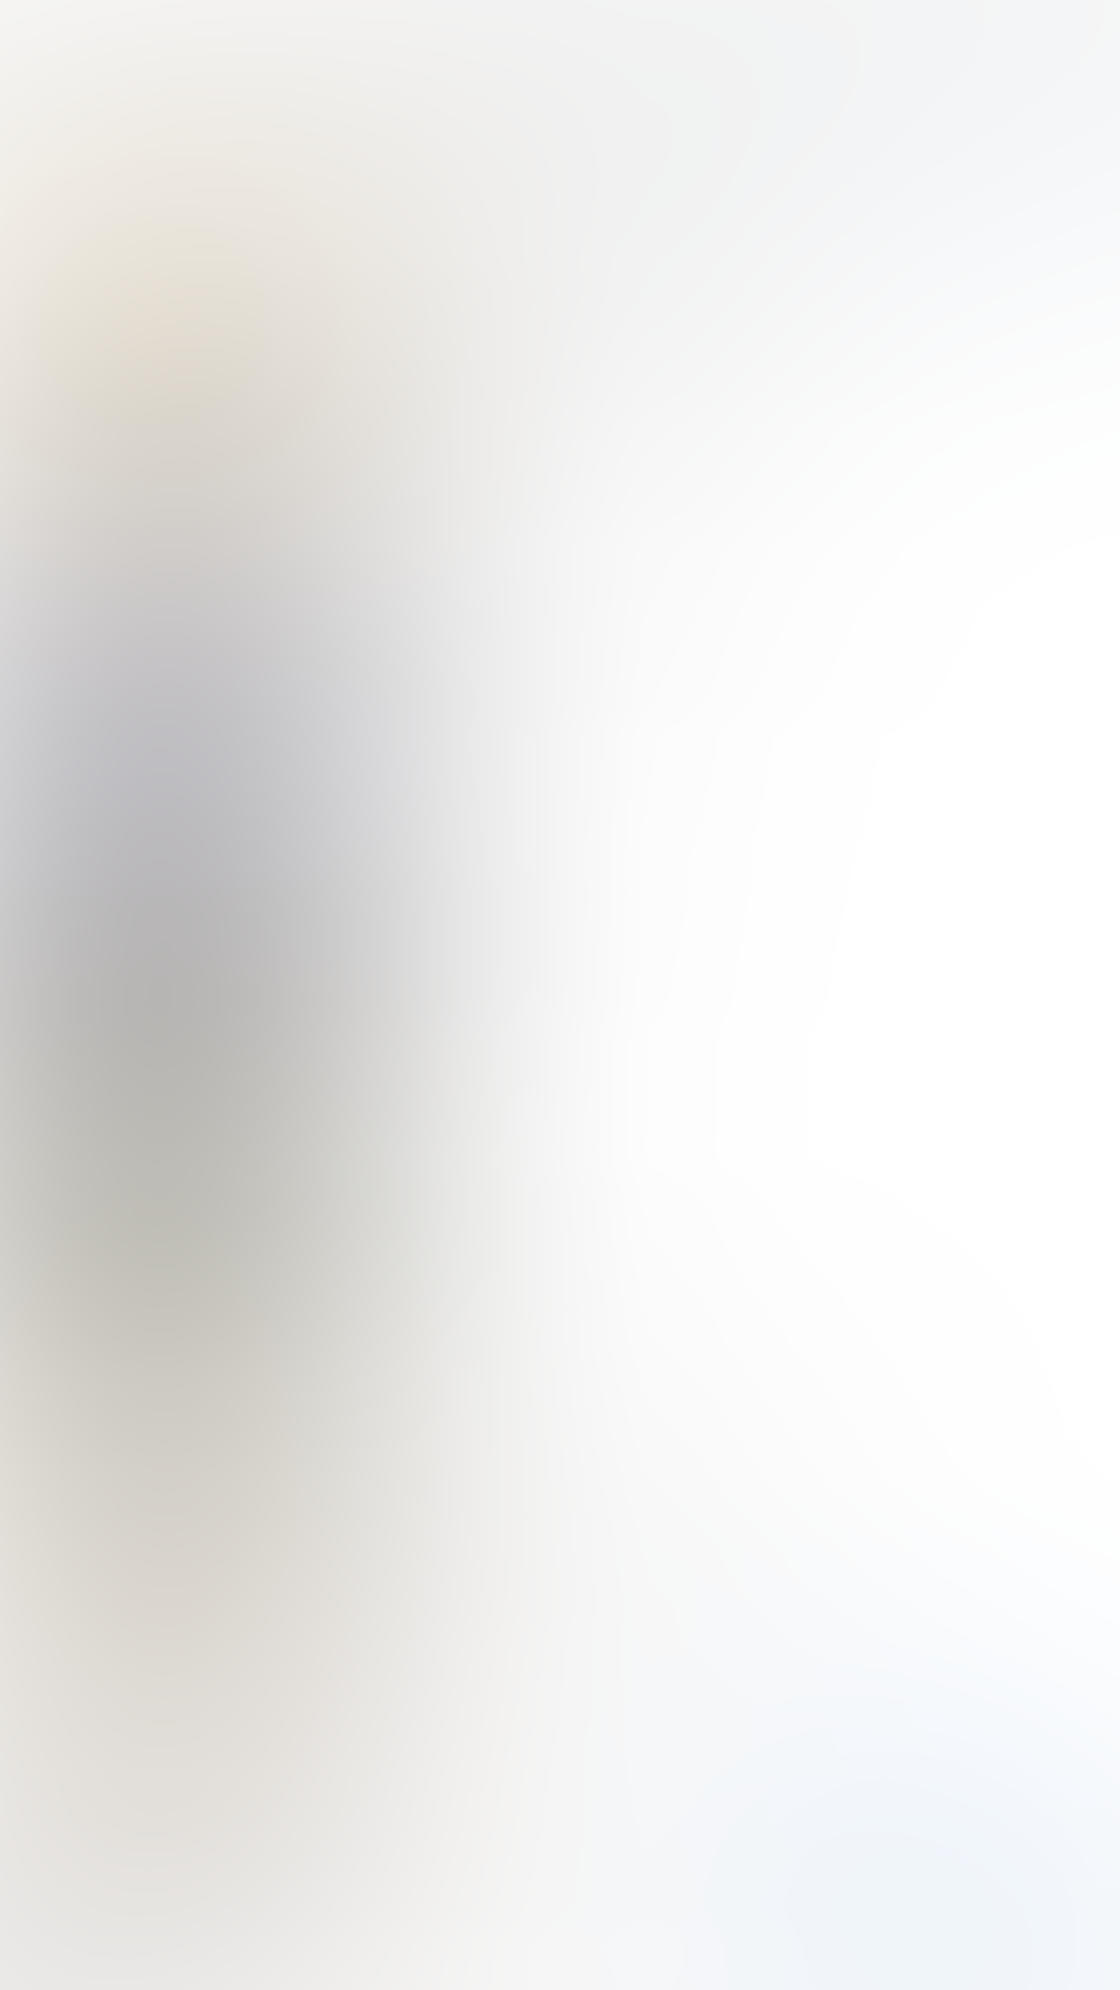 iOS 8 Photo Features 12